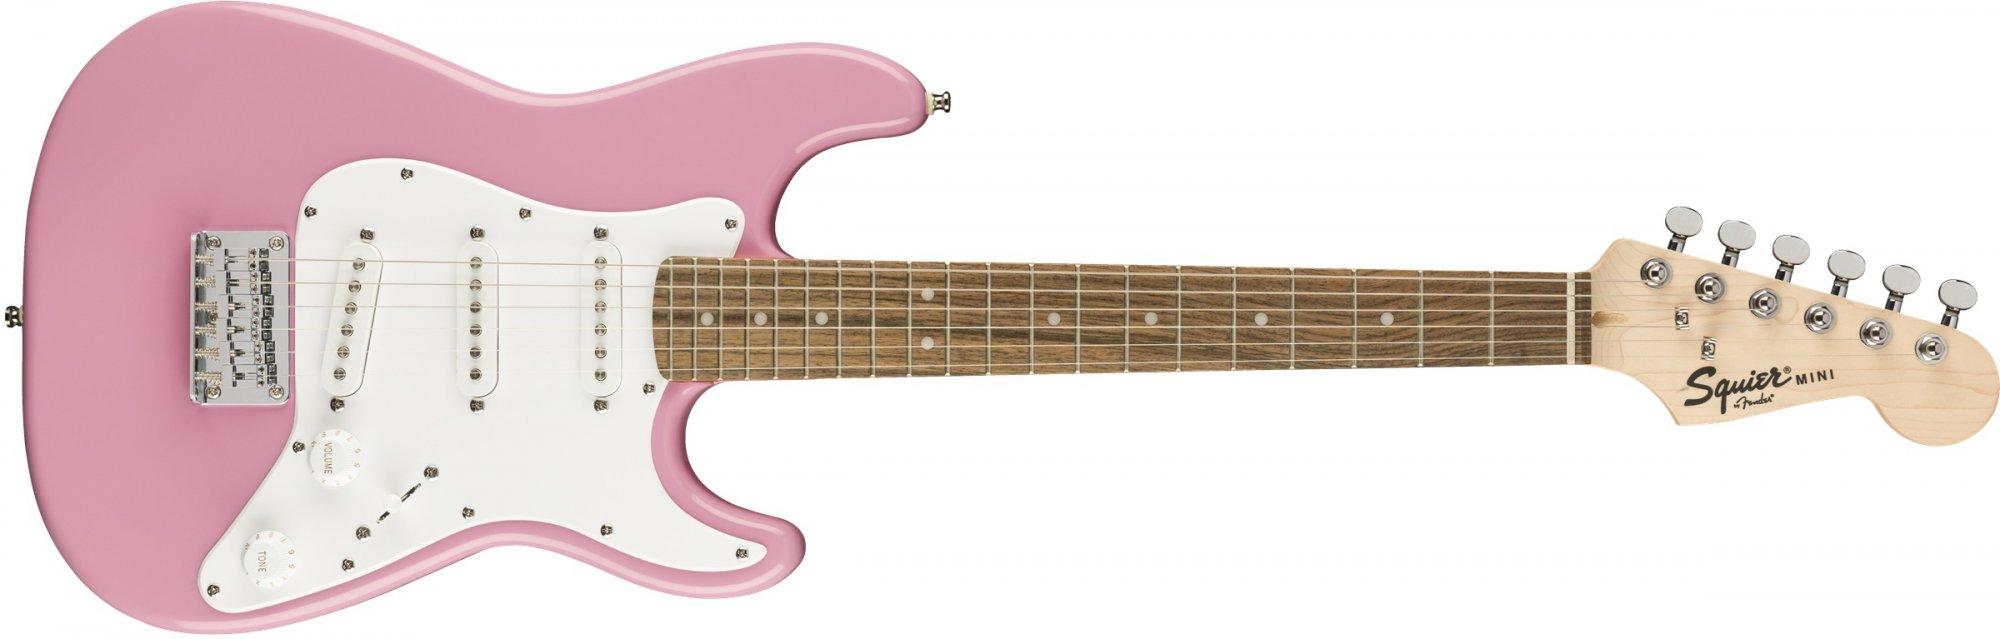 Fender Squier Mini Strat Electric Guitar-Pink